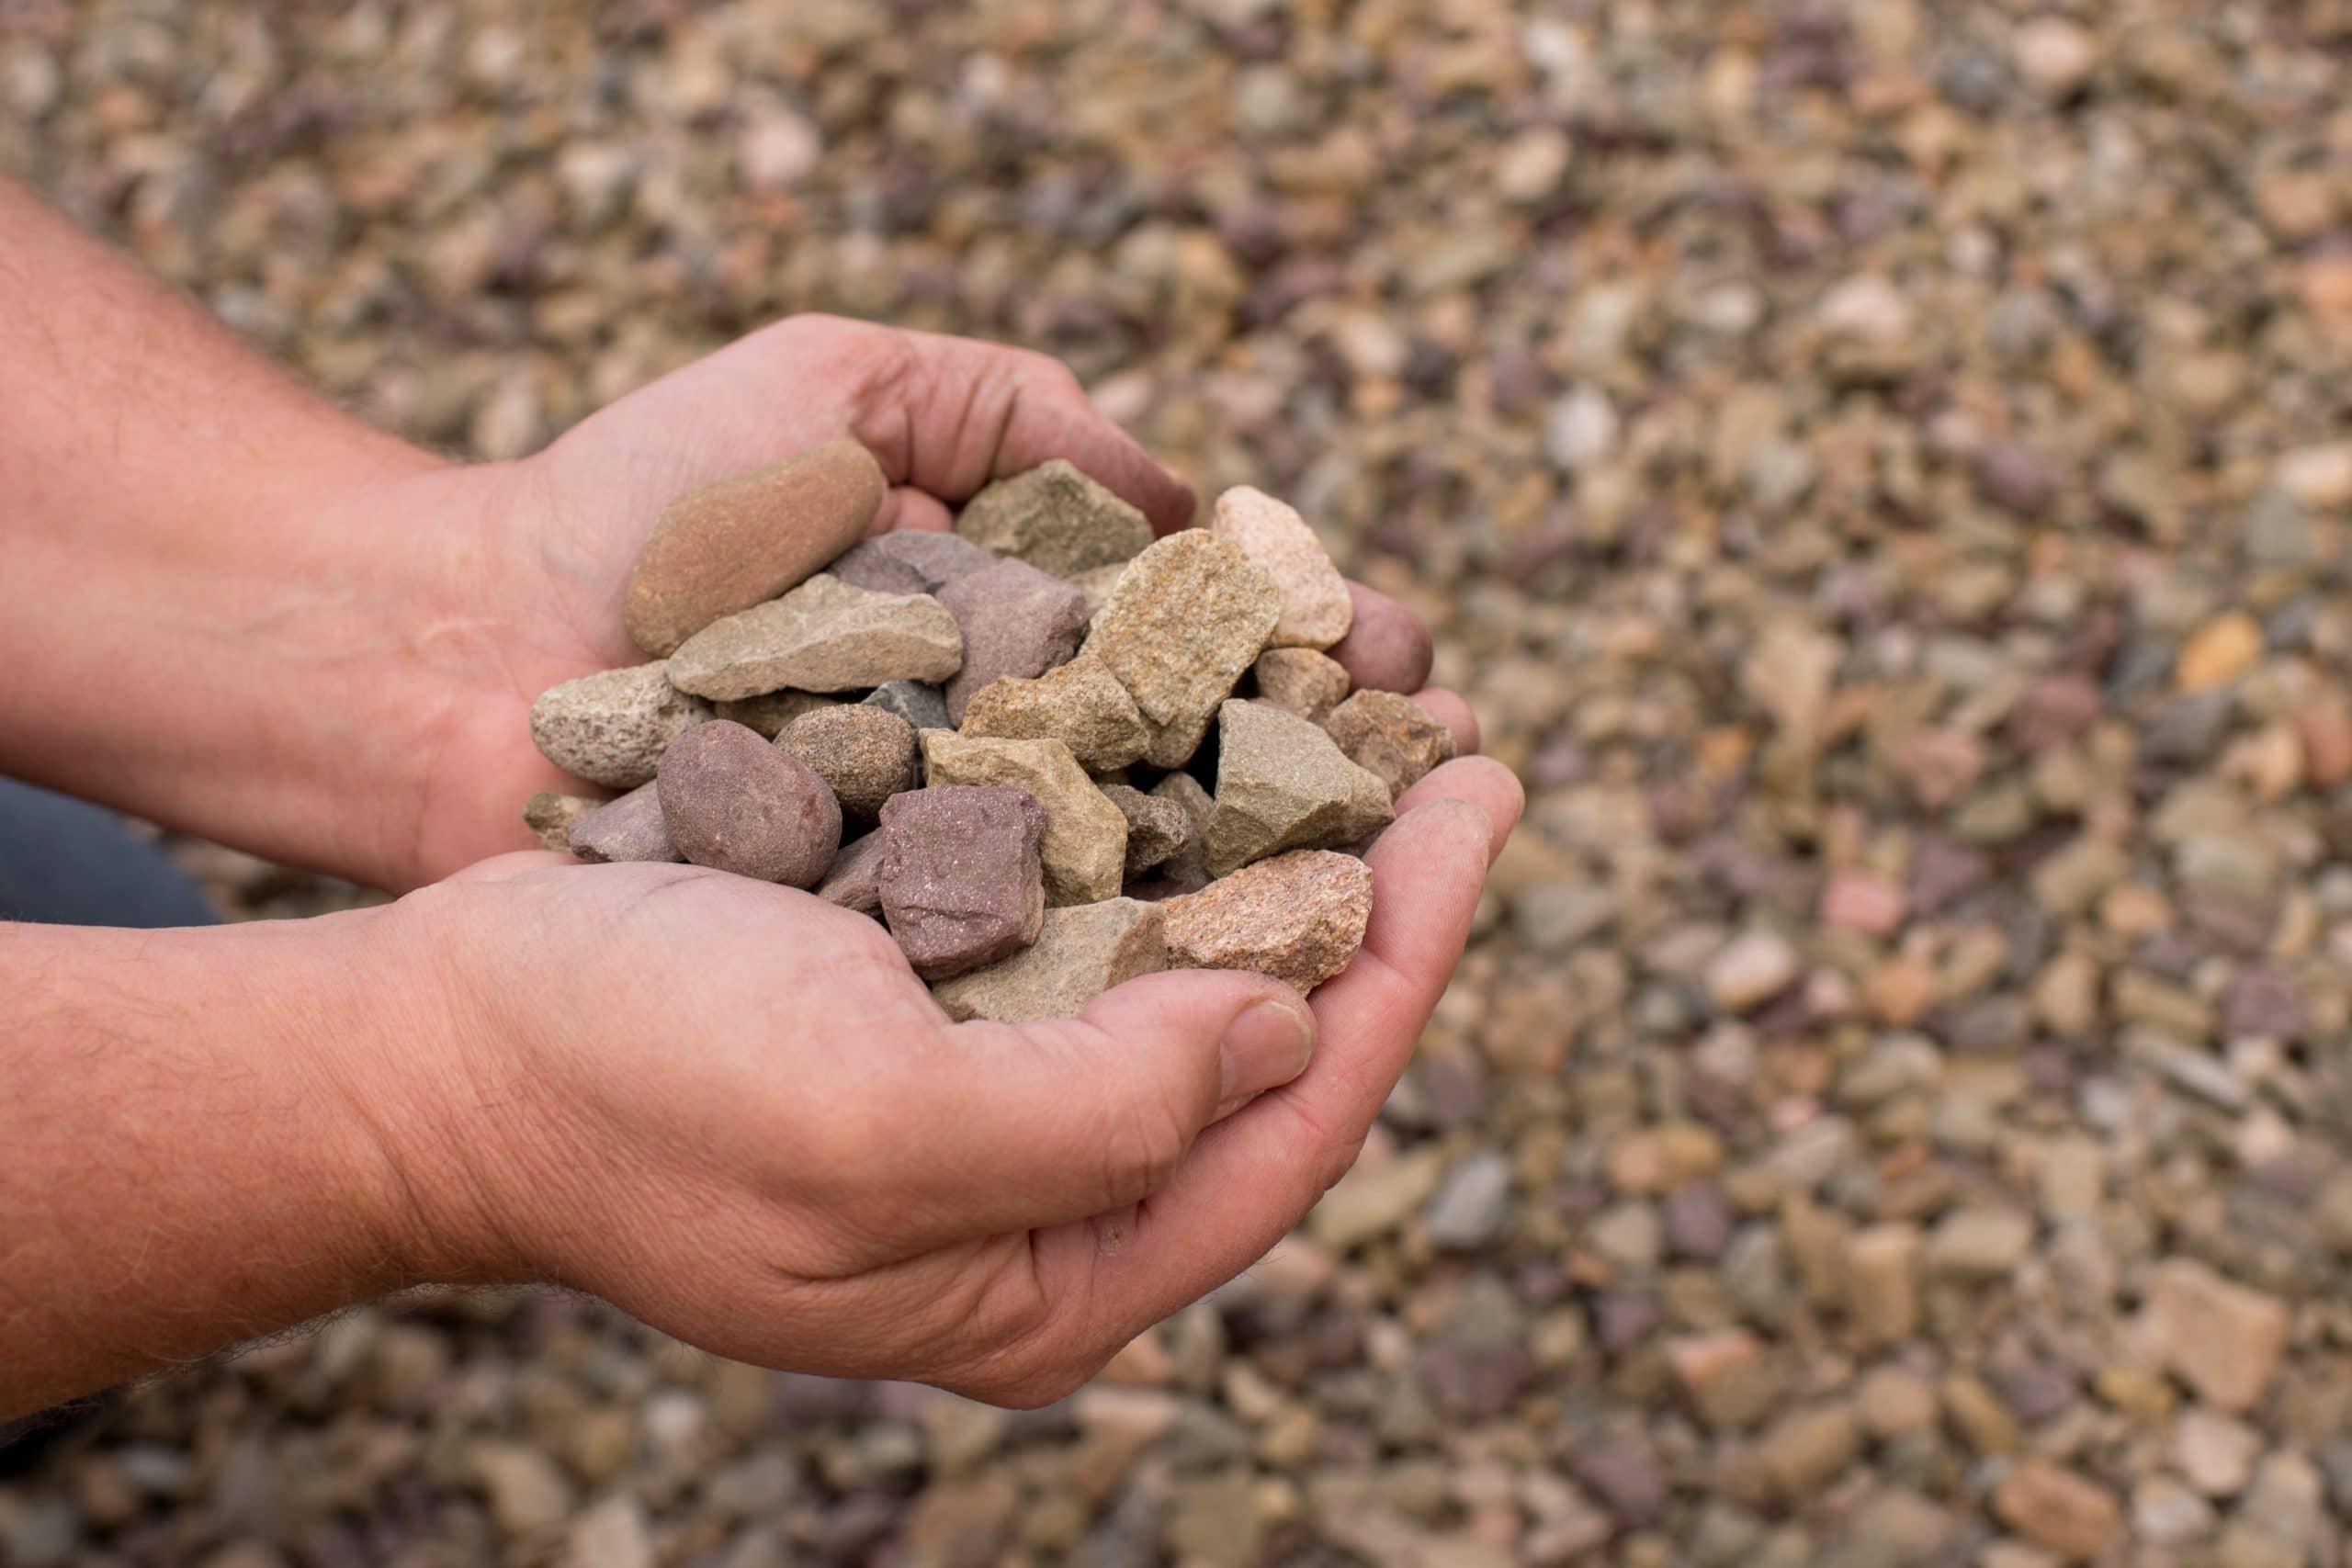 appalachian gravel 0.75 inch2